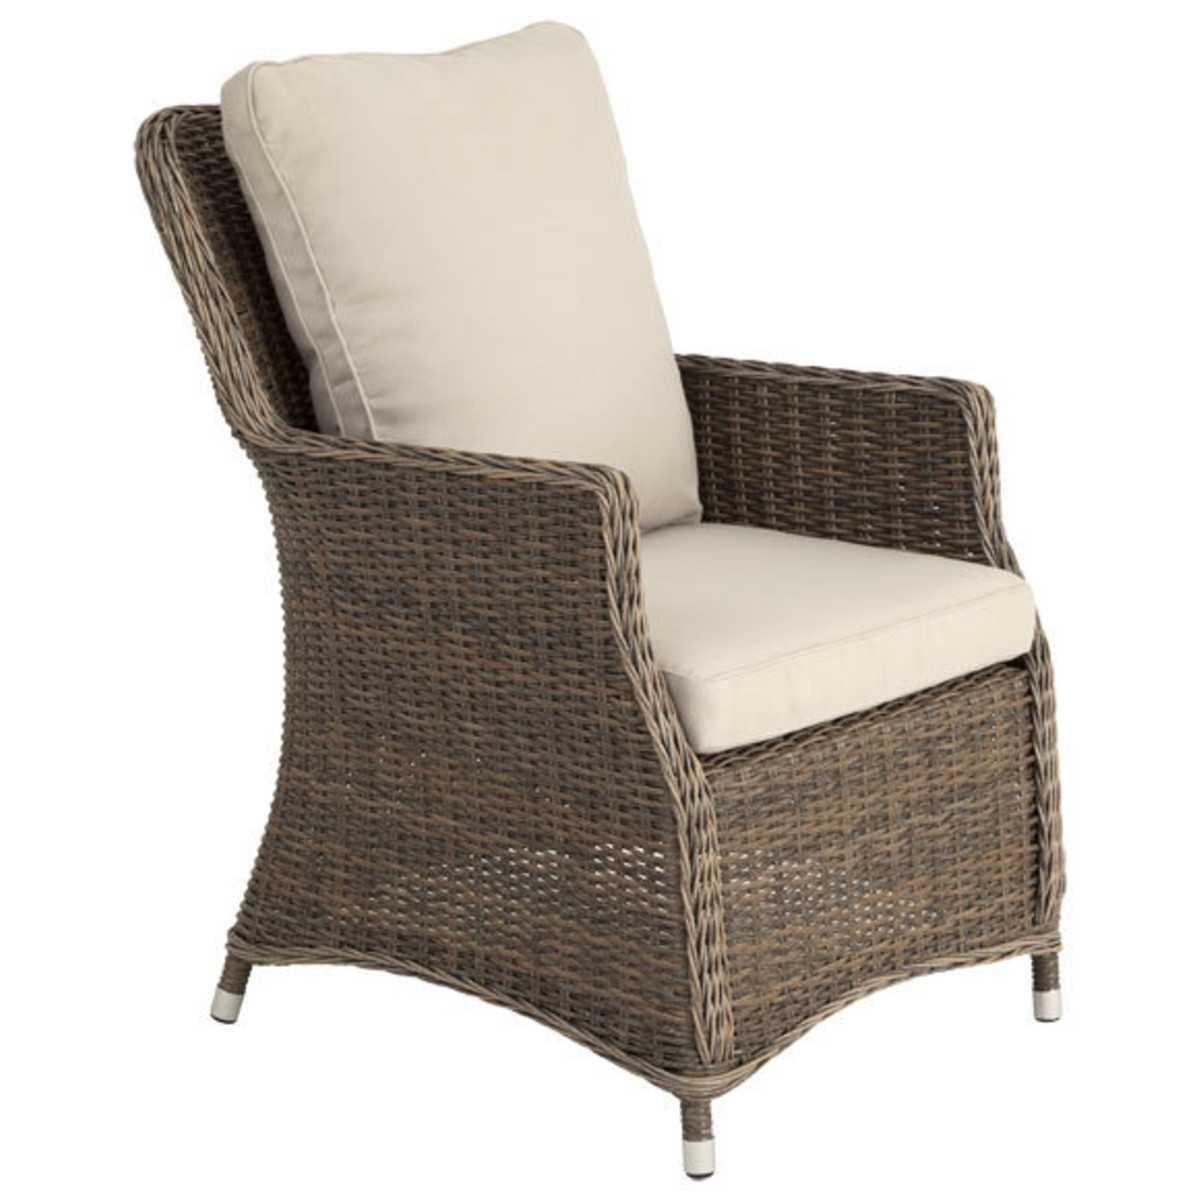 Кресло Садовое Manhattan Текстиль/Металл